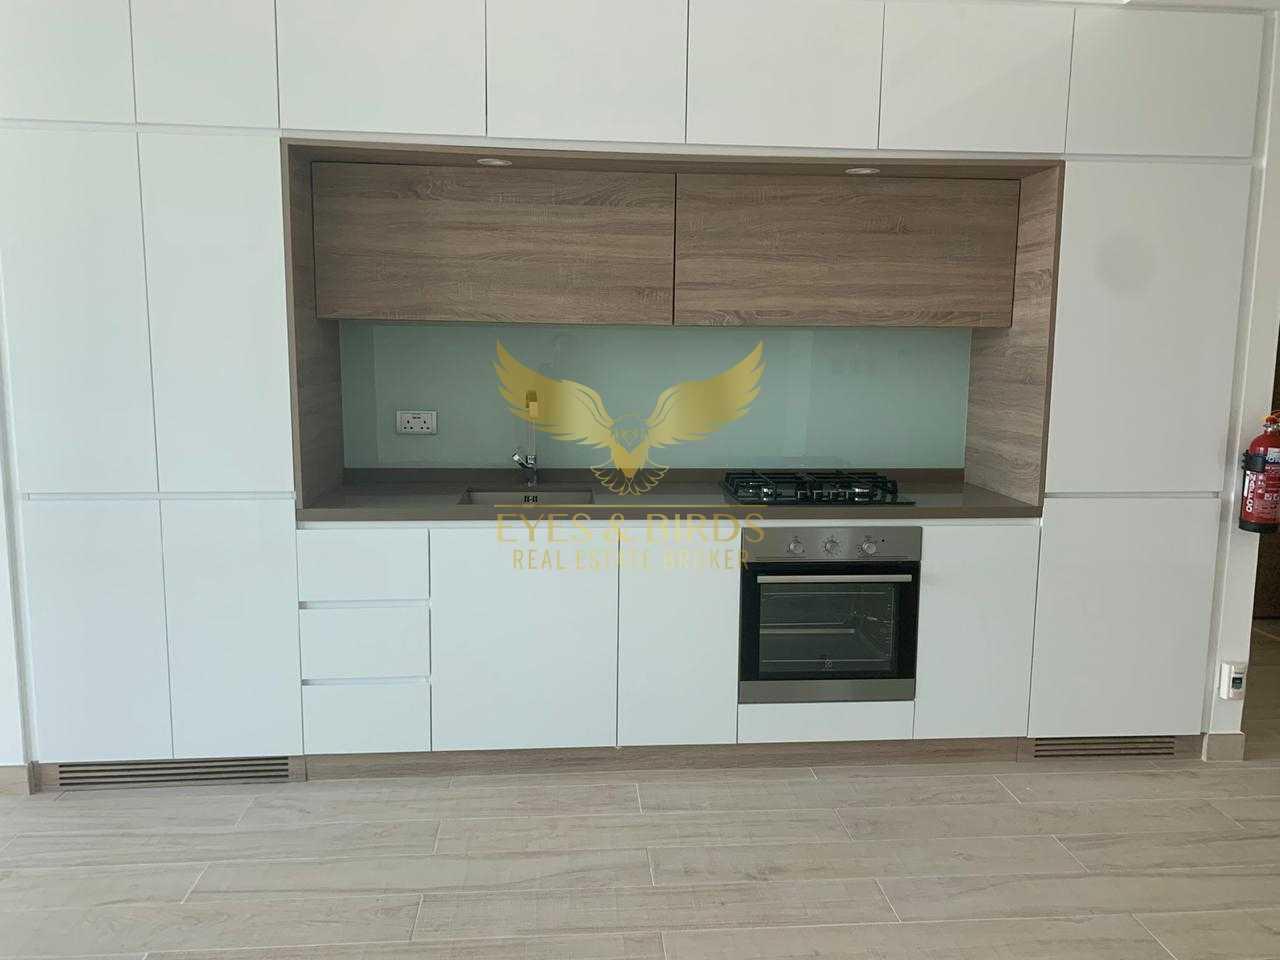 Two B/R apartment for SALE in Dubai Marina   Studio one